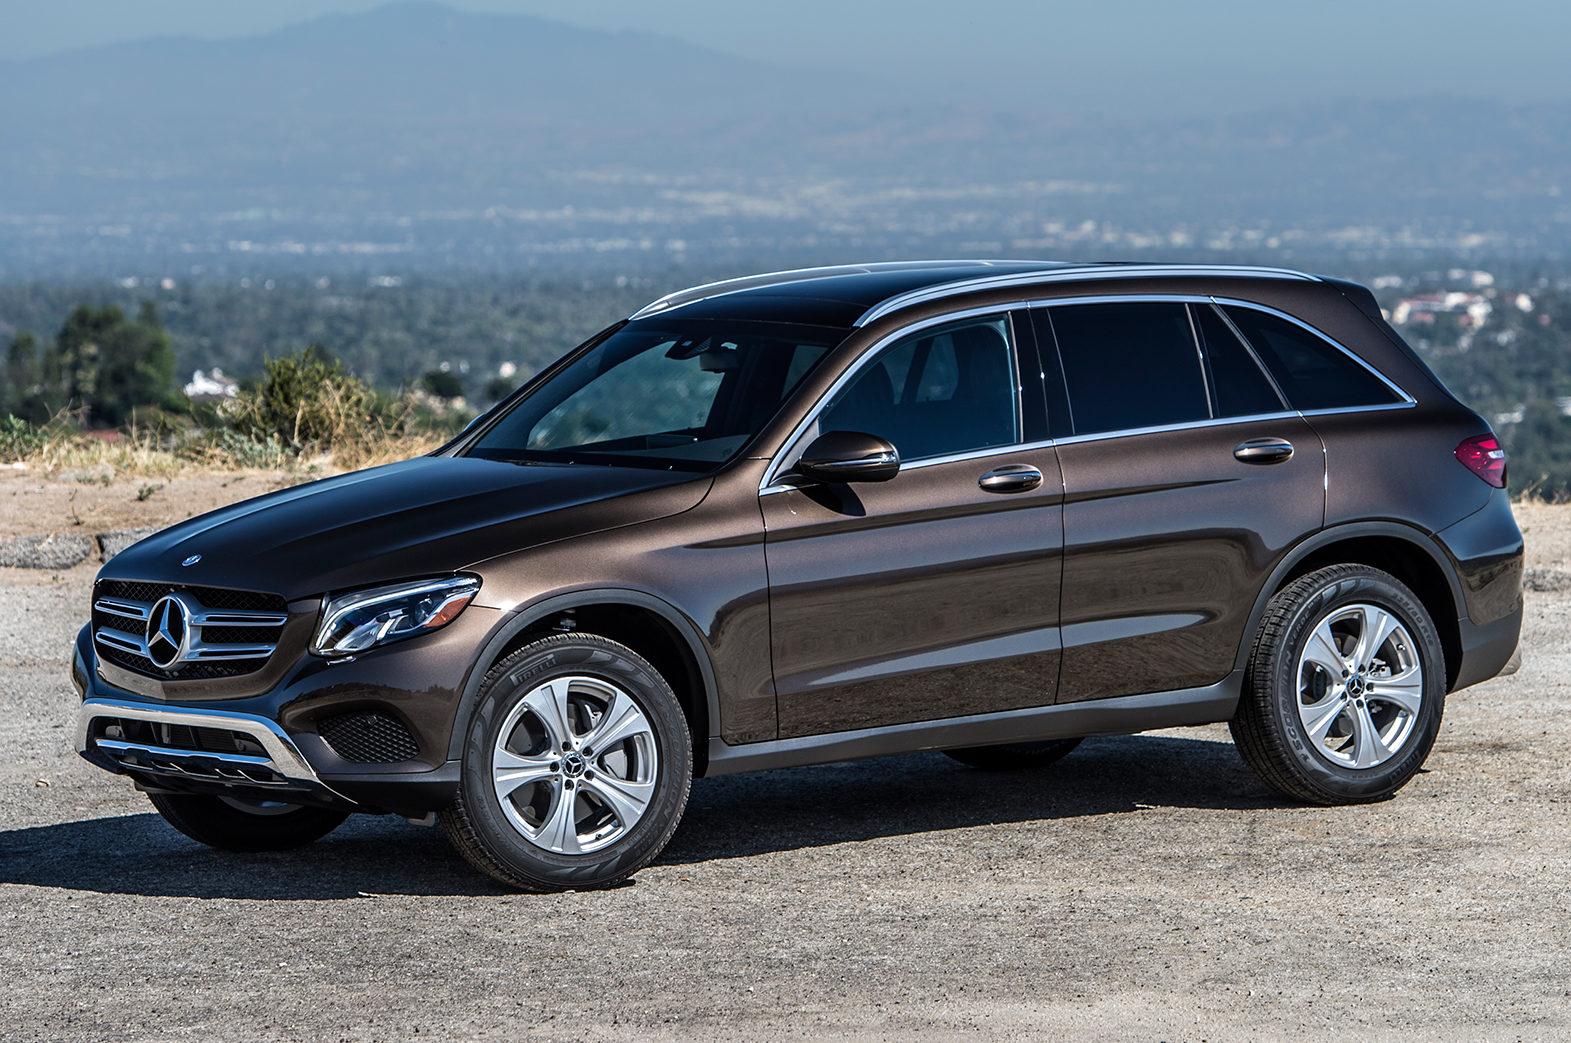 Название: 2017-Mercedes-Benz-GLC300-front-side-02-e1504288711186.jpg Просмотров: 441  Размер: 379.2 Кб